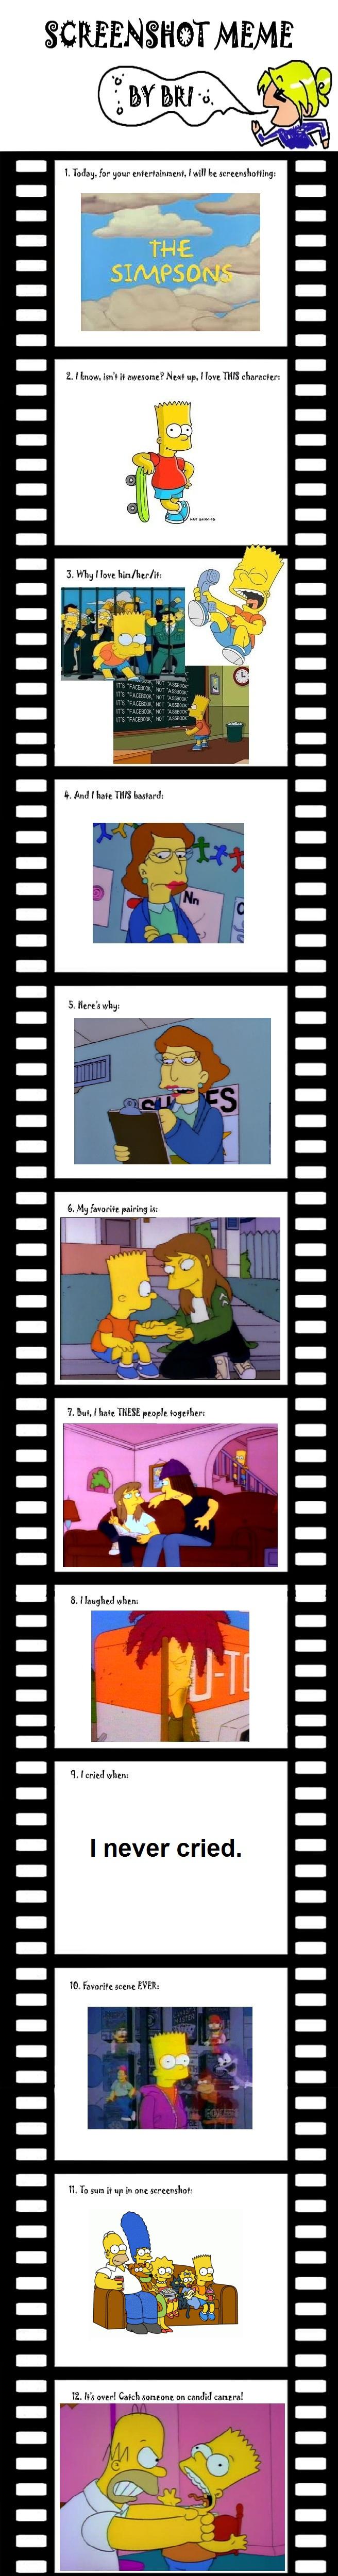 Simpsons Screenshot Meme by DarkDiddyKong